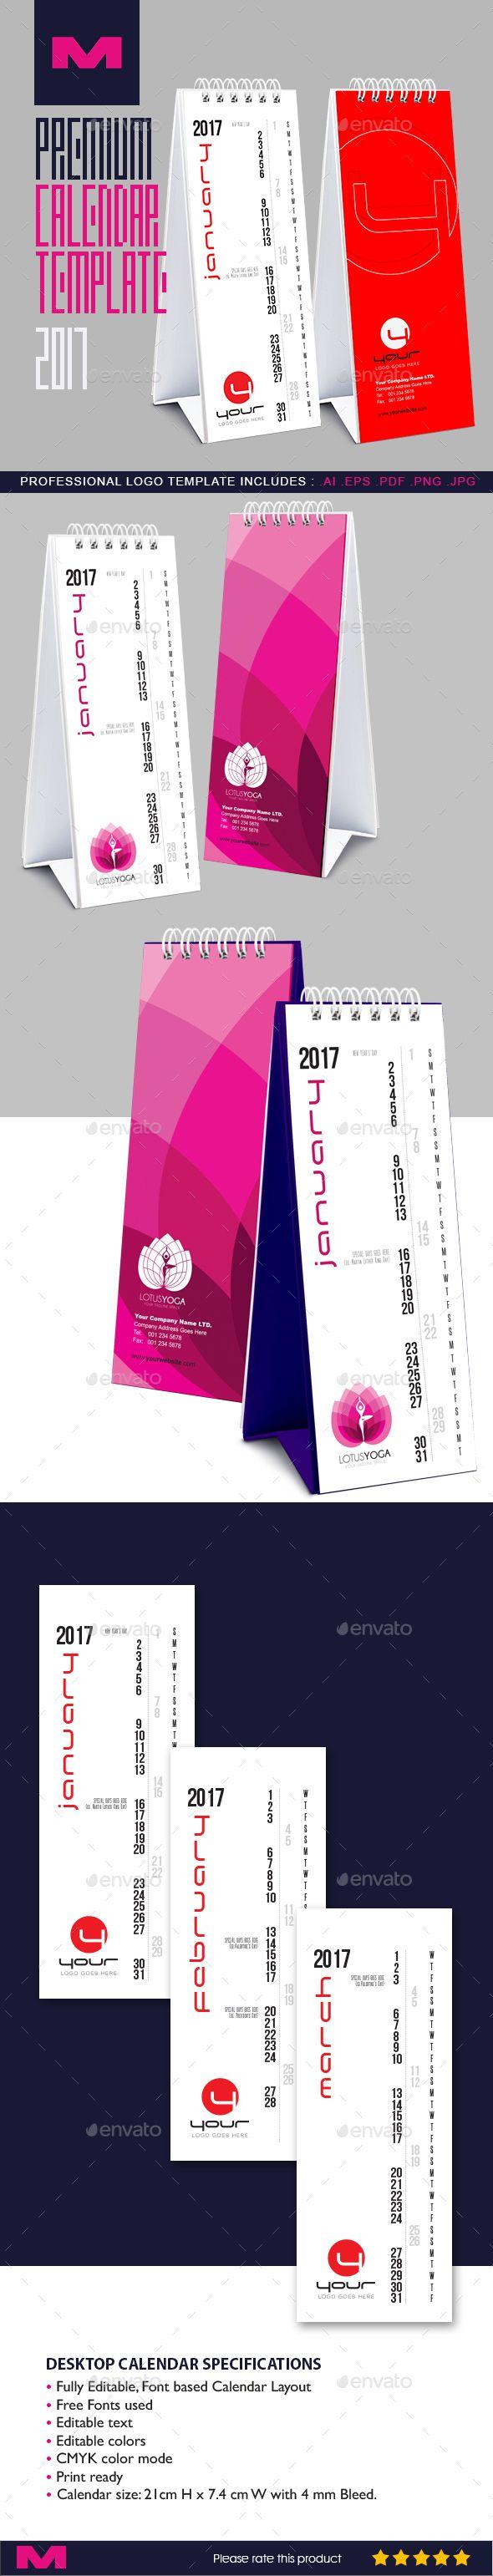 Premium Desktop Calendar Template 2017 — InDesign INDD #clean #corporate • Download ➝ https://graphicriver.net/item/premium-desktop-calendar-template-2017/19190613?ref=pxcr